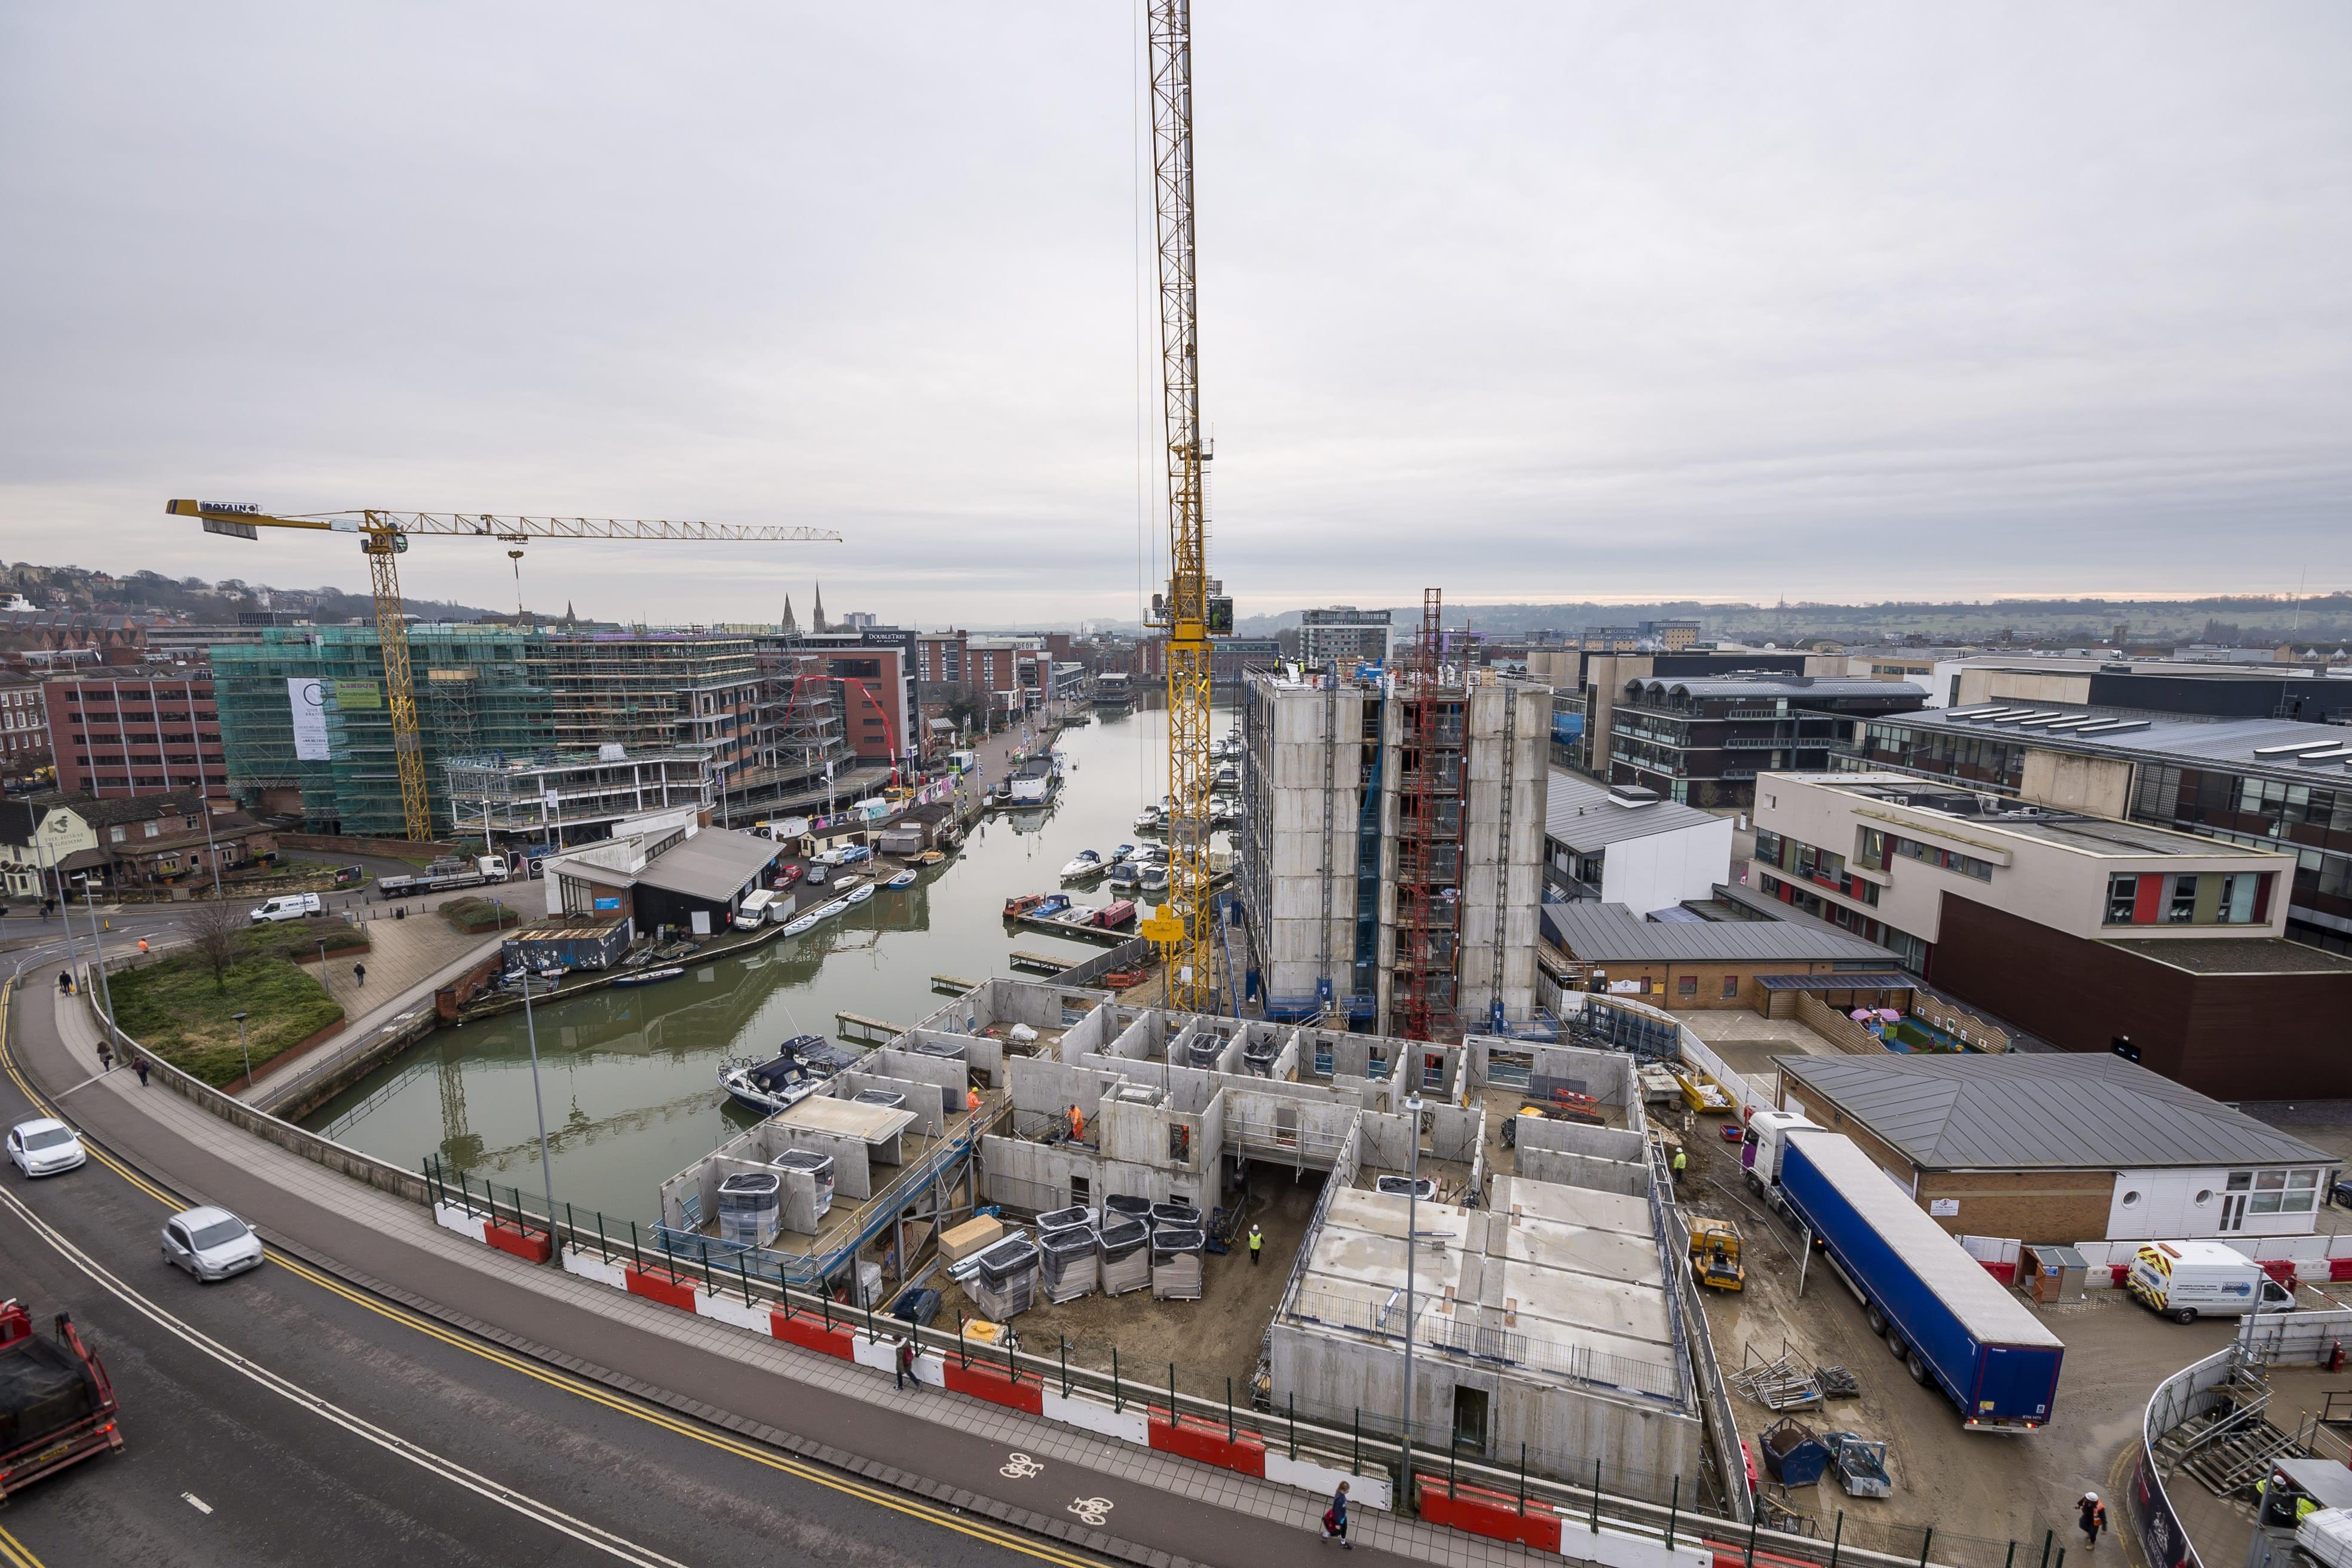 Cygnet Wharf - Bowmer and Kirkland